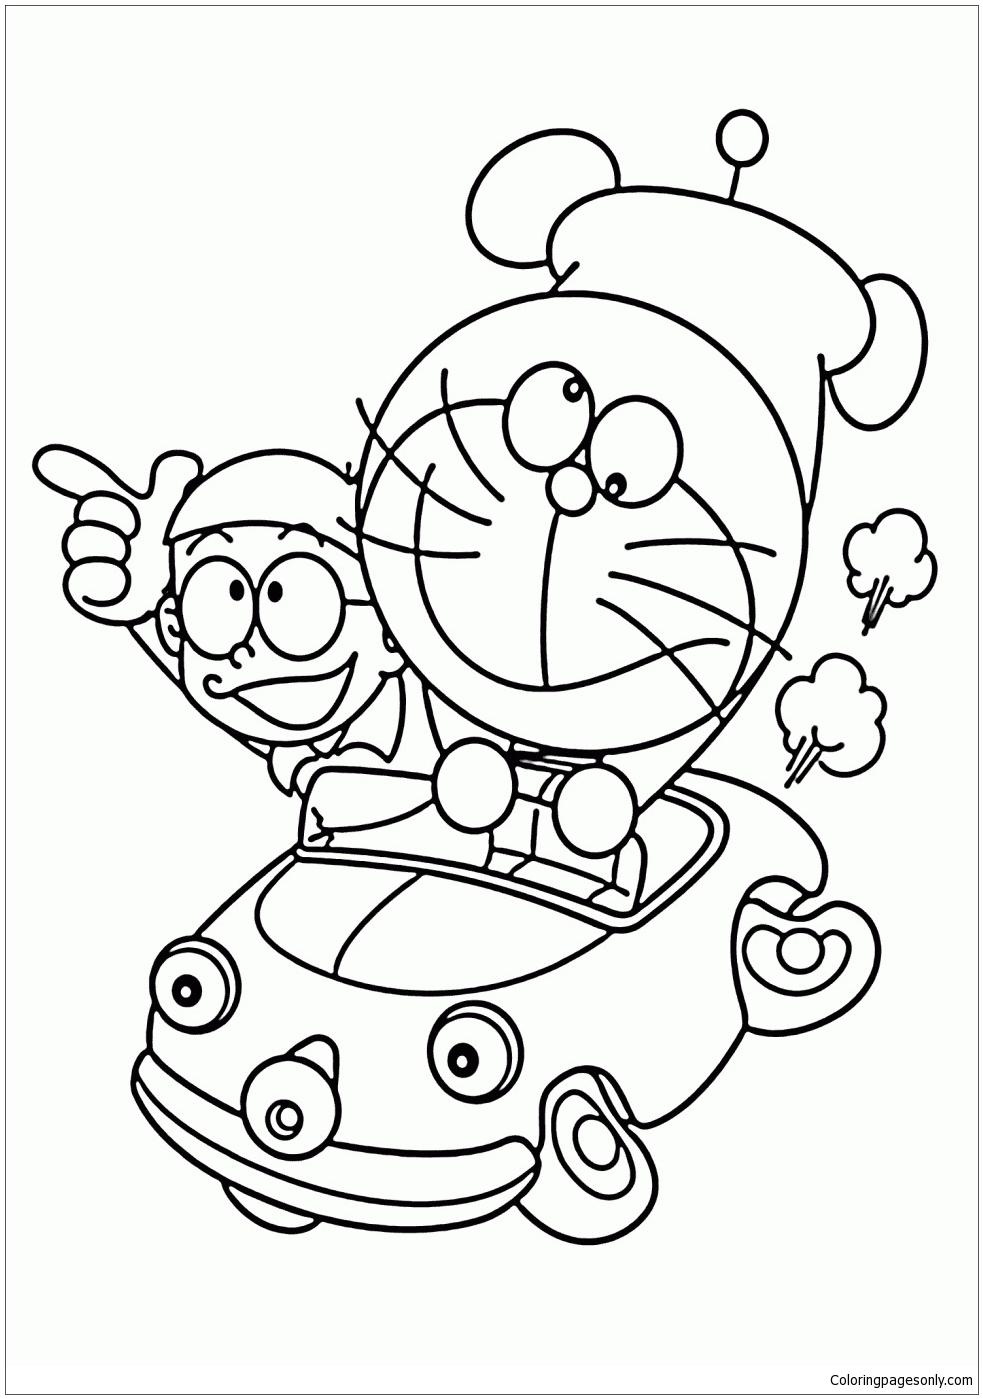 Doraemon And Nobita In Car Coloring Page